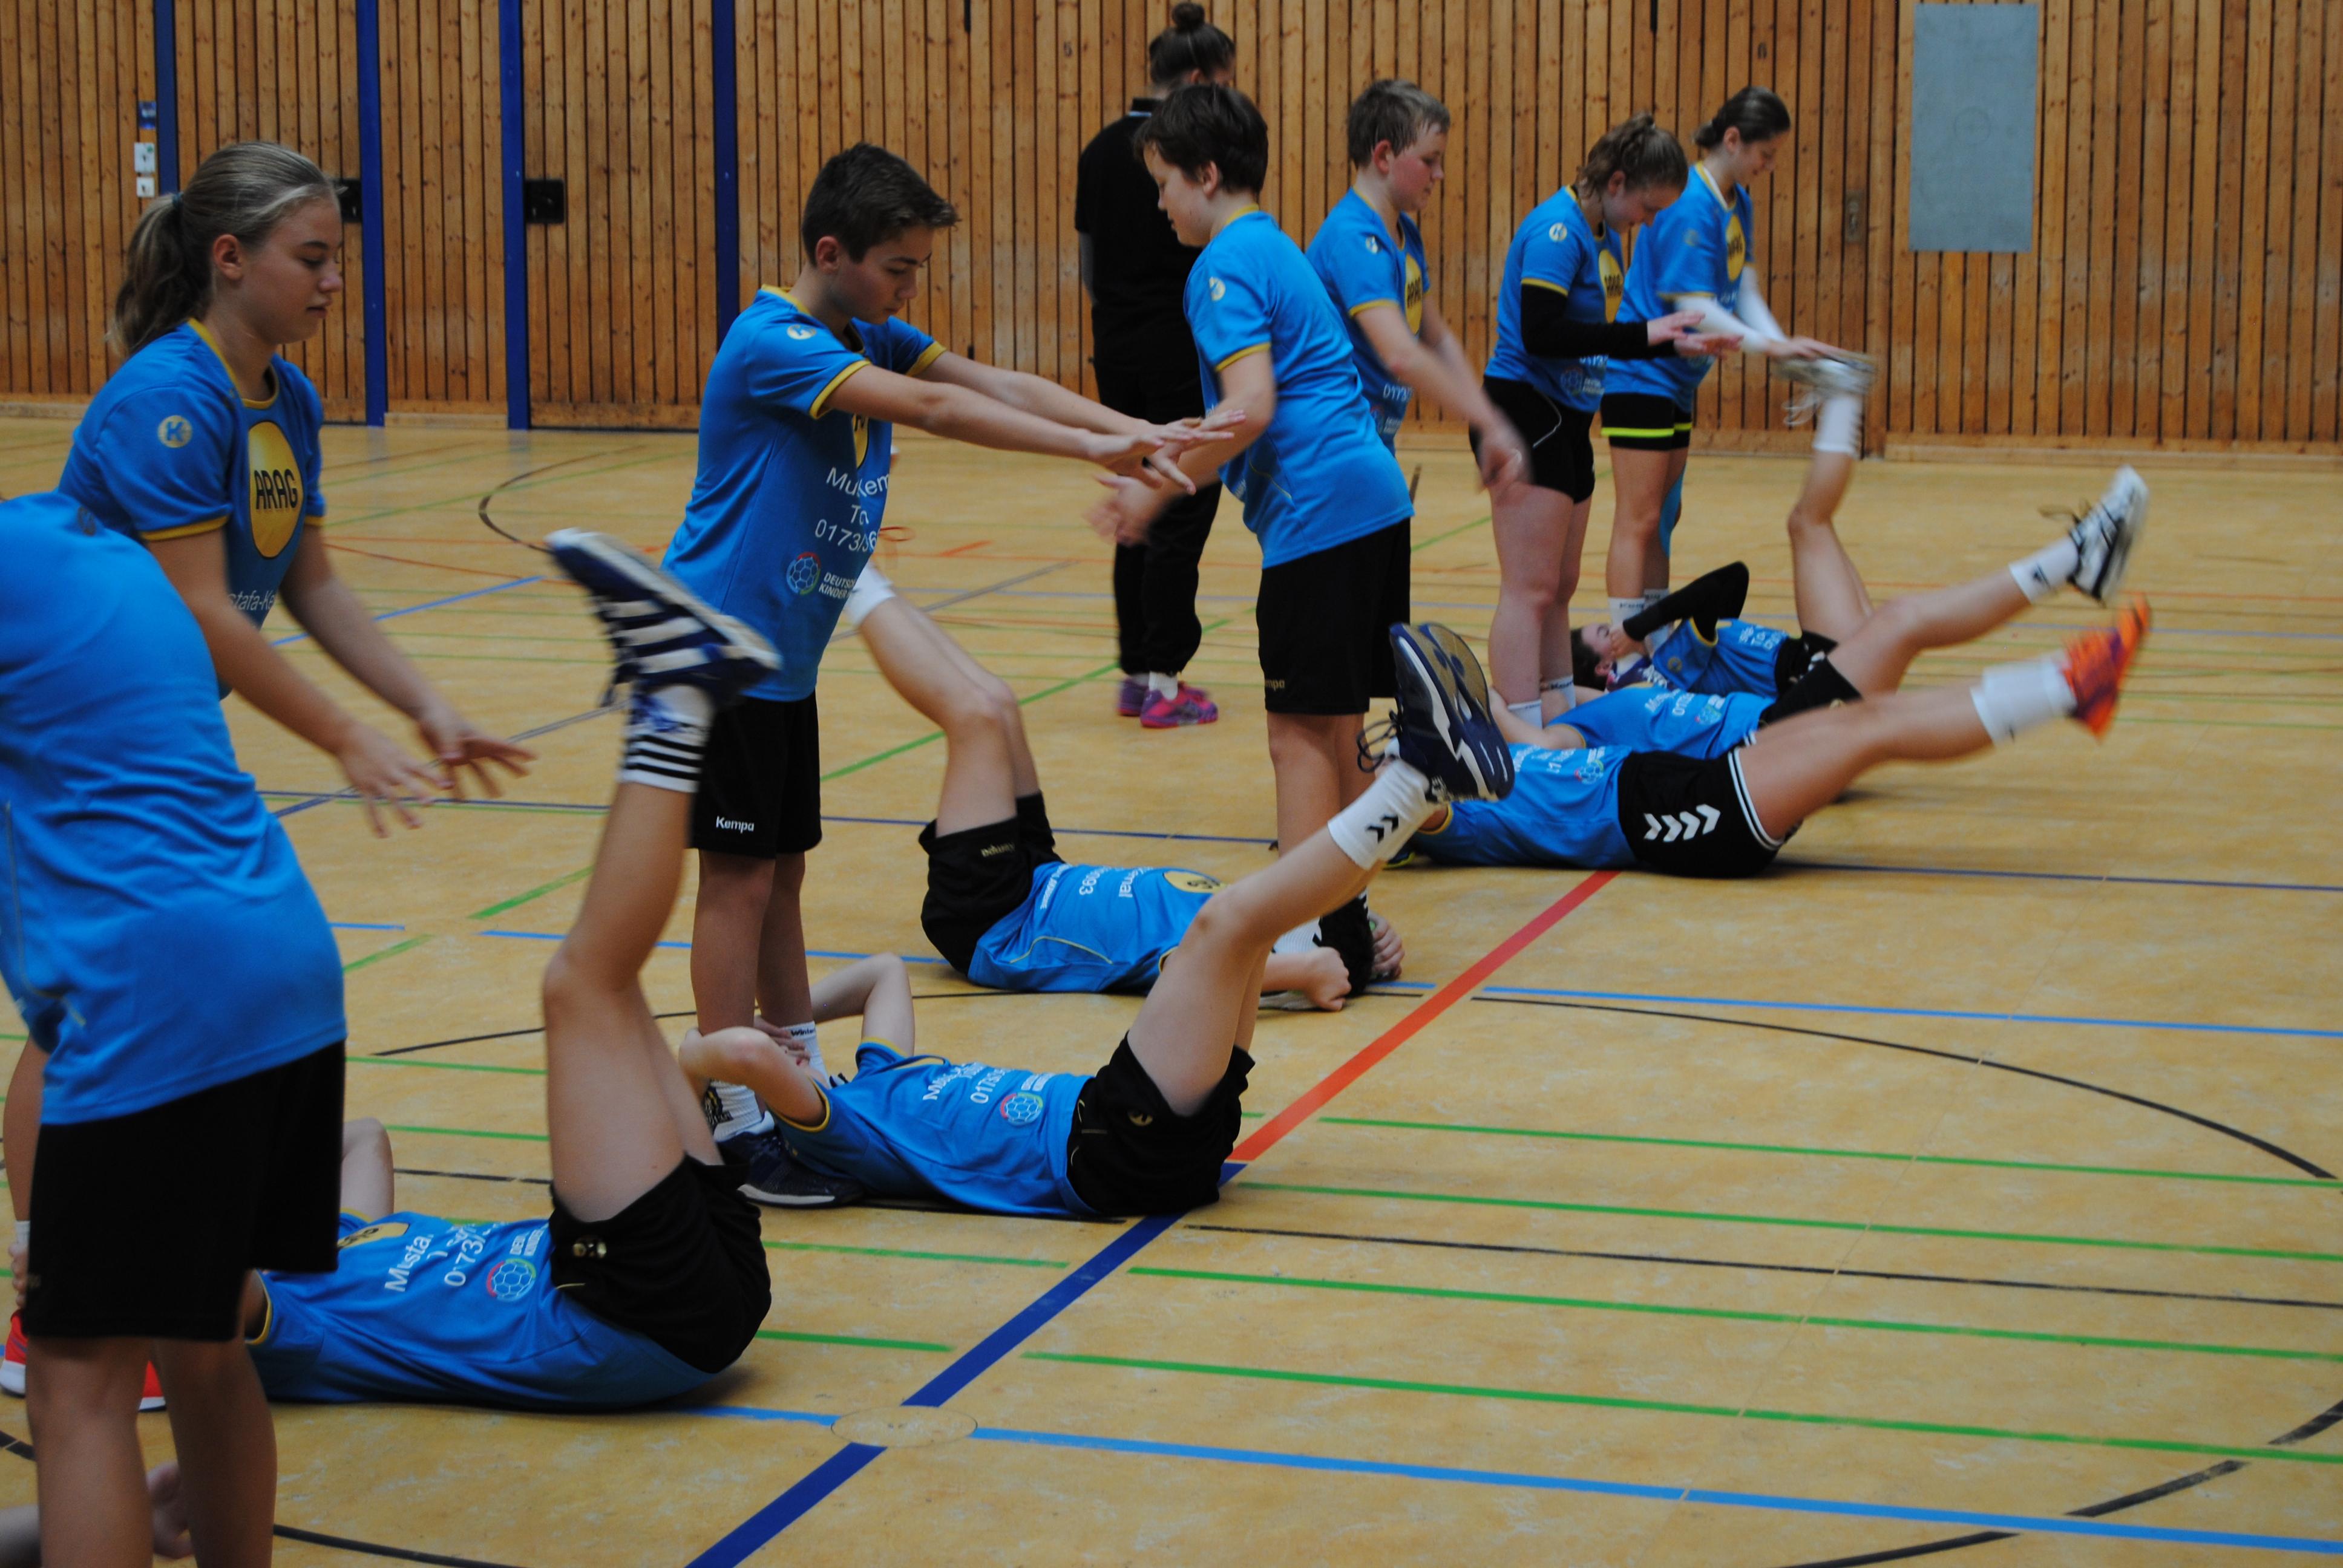 Handball Reichenbach